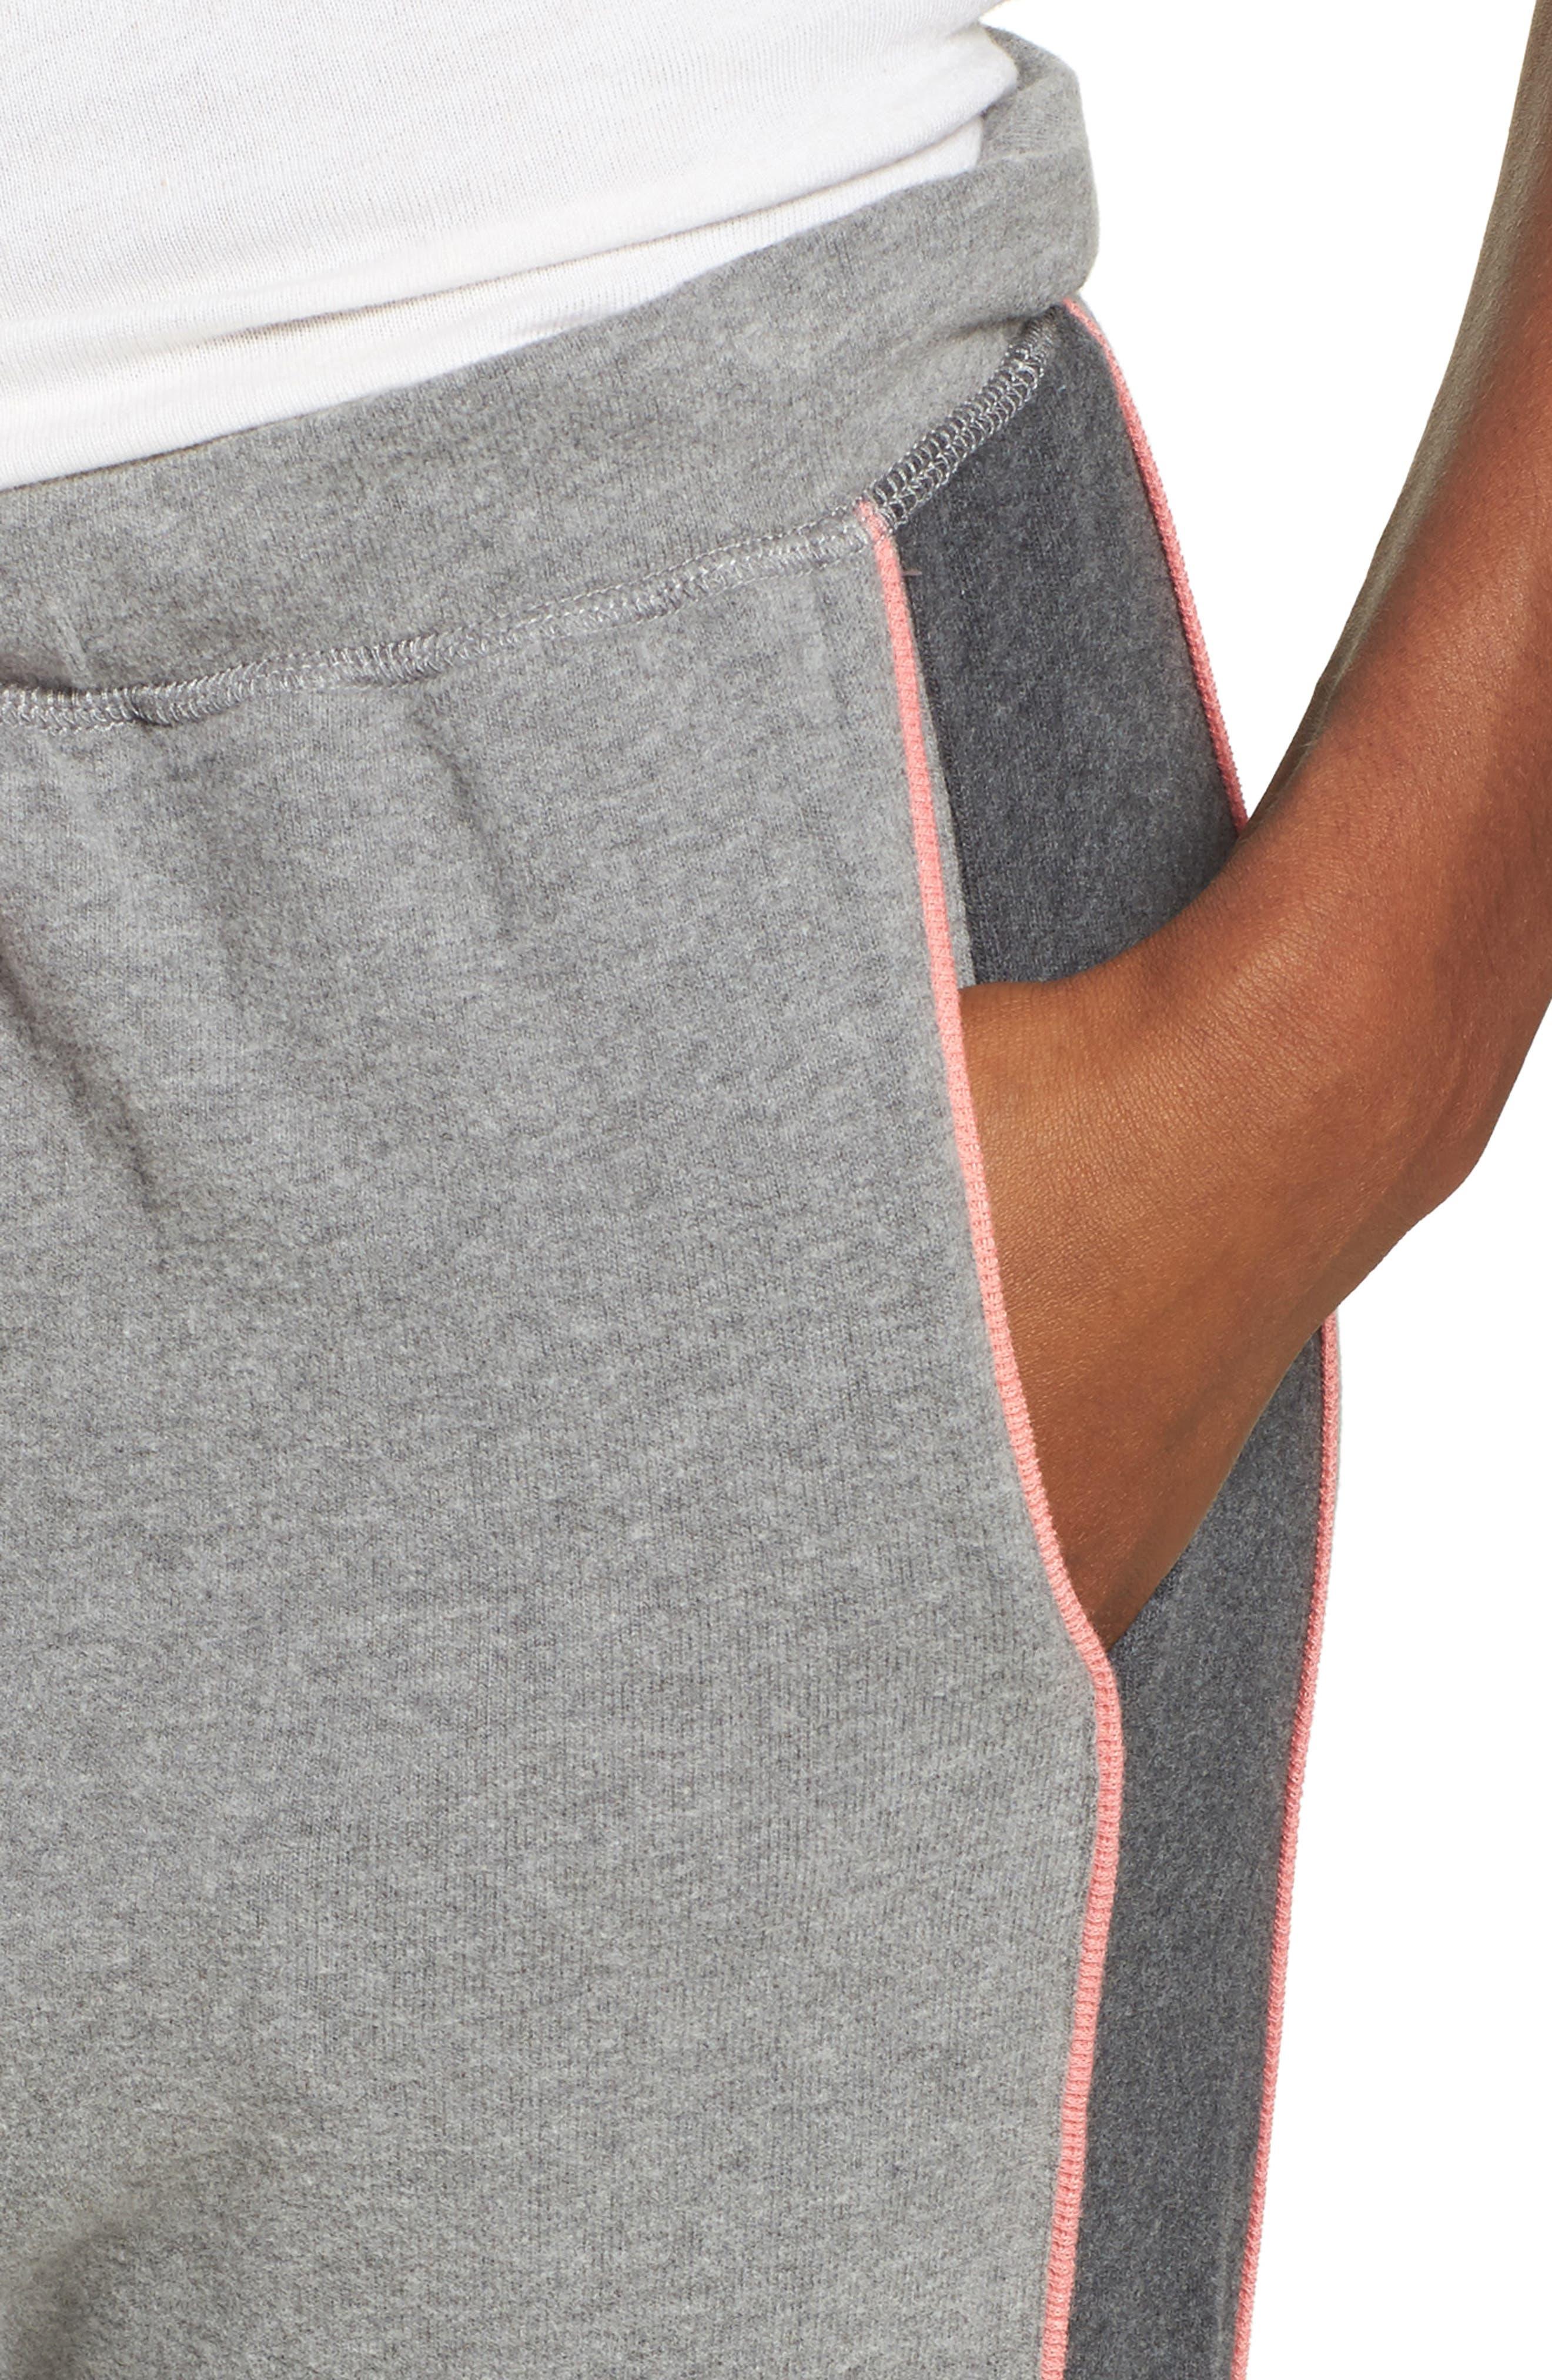 Brushed Hacci Lounge Jogger Pants,                             Alternate thumbnail 4, color,                             052